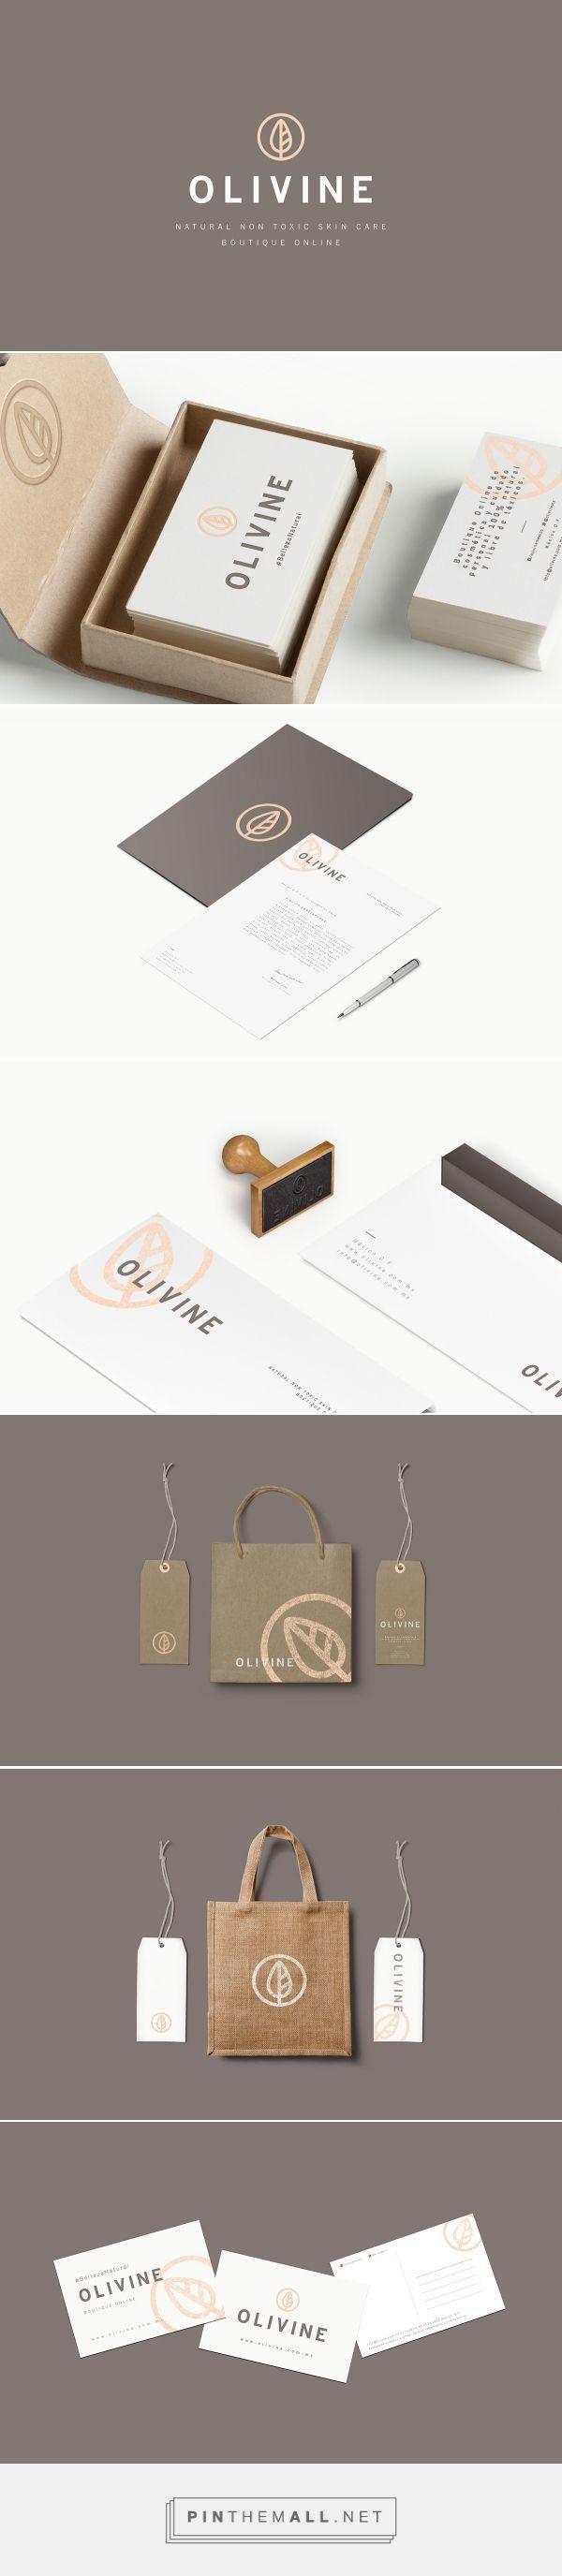 OLIVINE on Behance | Fivestar Branding – Design and Branding Agency & Inspiration Gallery  http://jrstudioweb.com/diseno-grafico/diseno-de-logotipos/